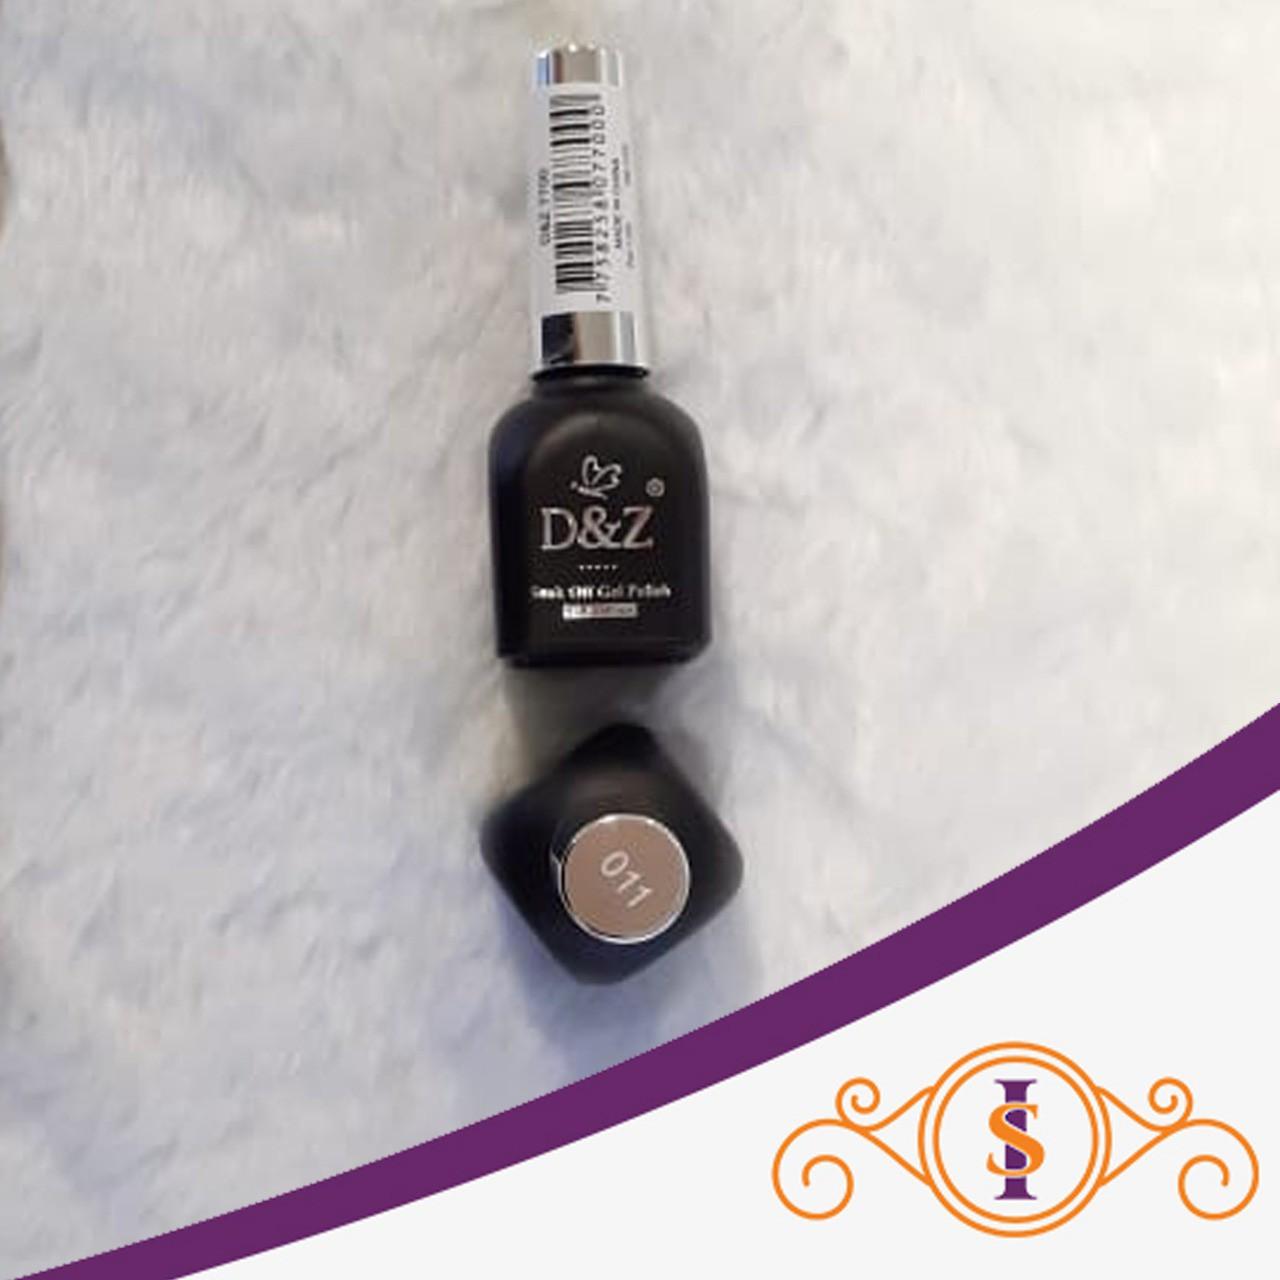 Esmalte em Gel D&Z 12ml - Soak Off Gel Polish - Cor 011